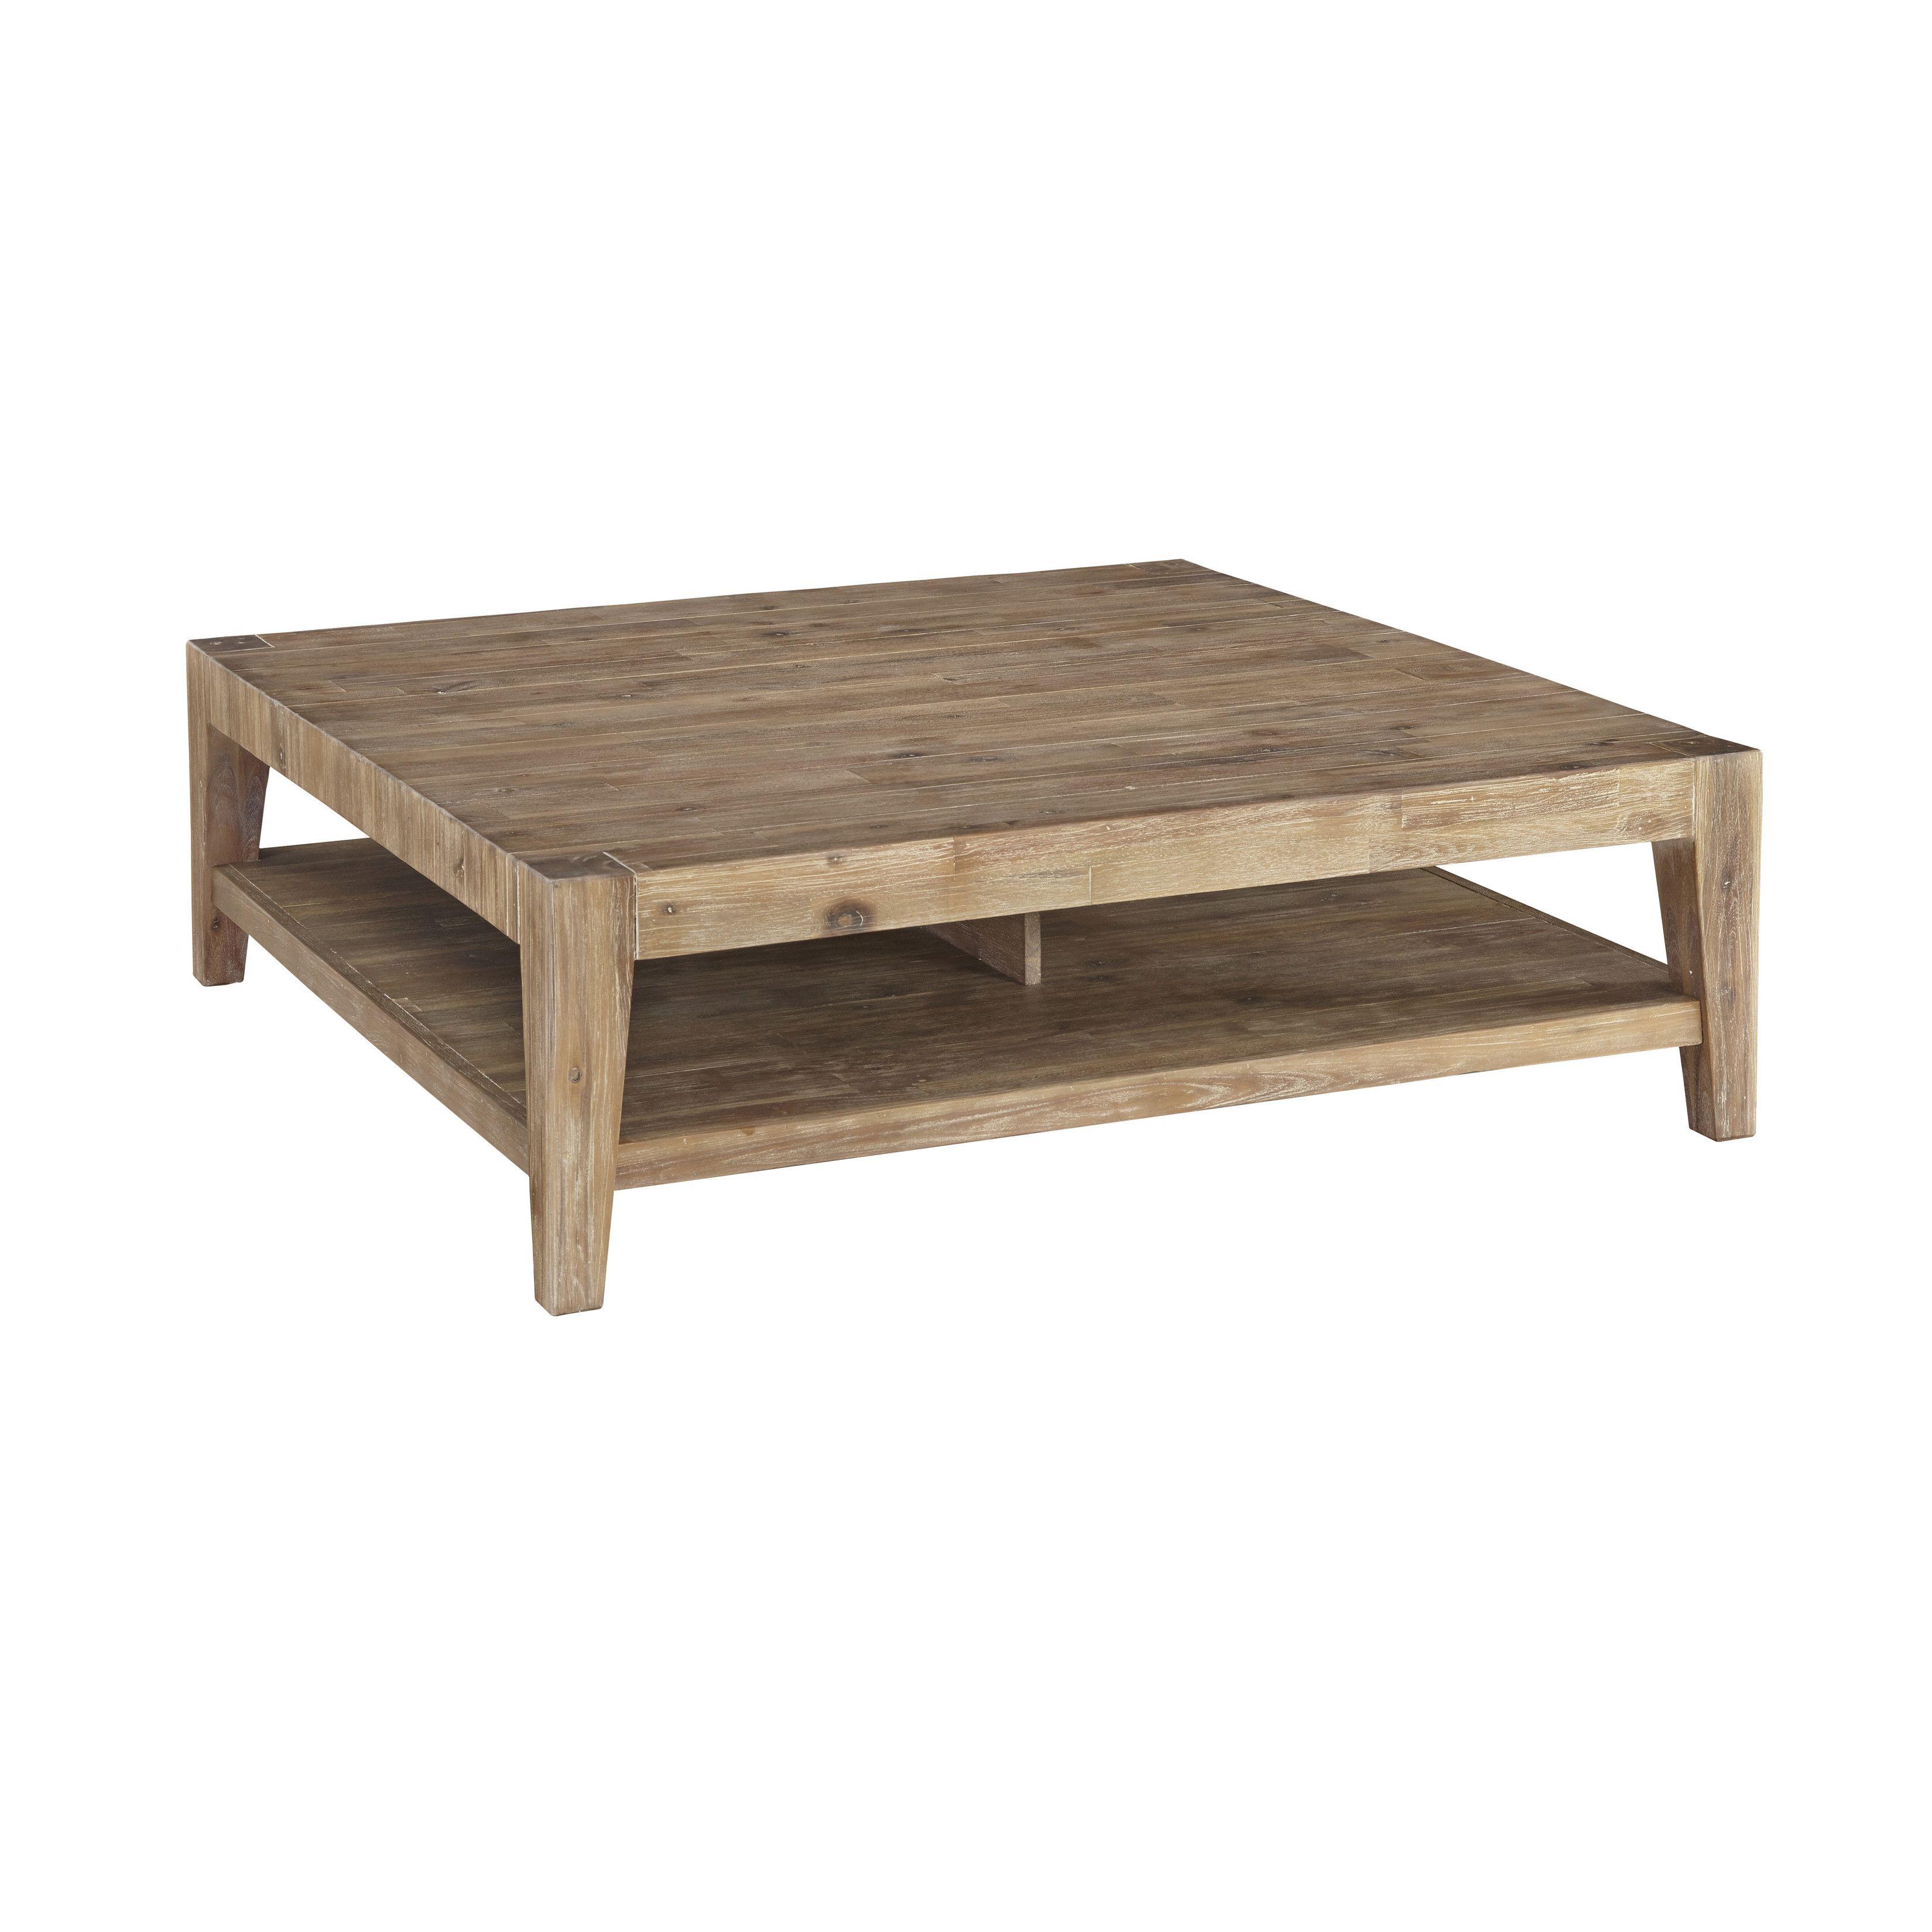 Casana Furniture Company Tyler Coffee Table Square Wood Coffee Table Brown Coffee Table Coffee Table Farmhouse [ 3300 x 3300 Pixel ]